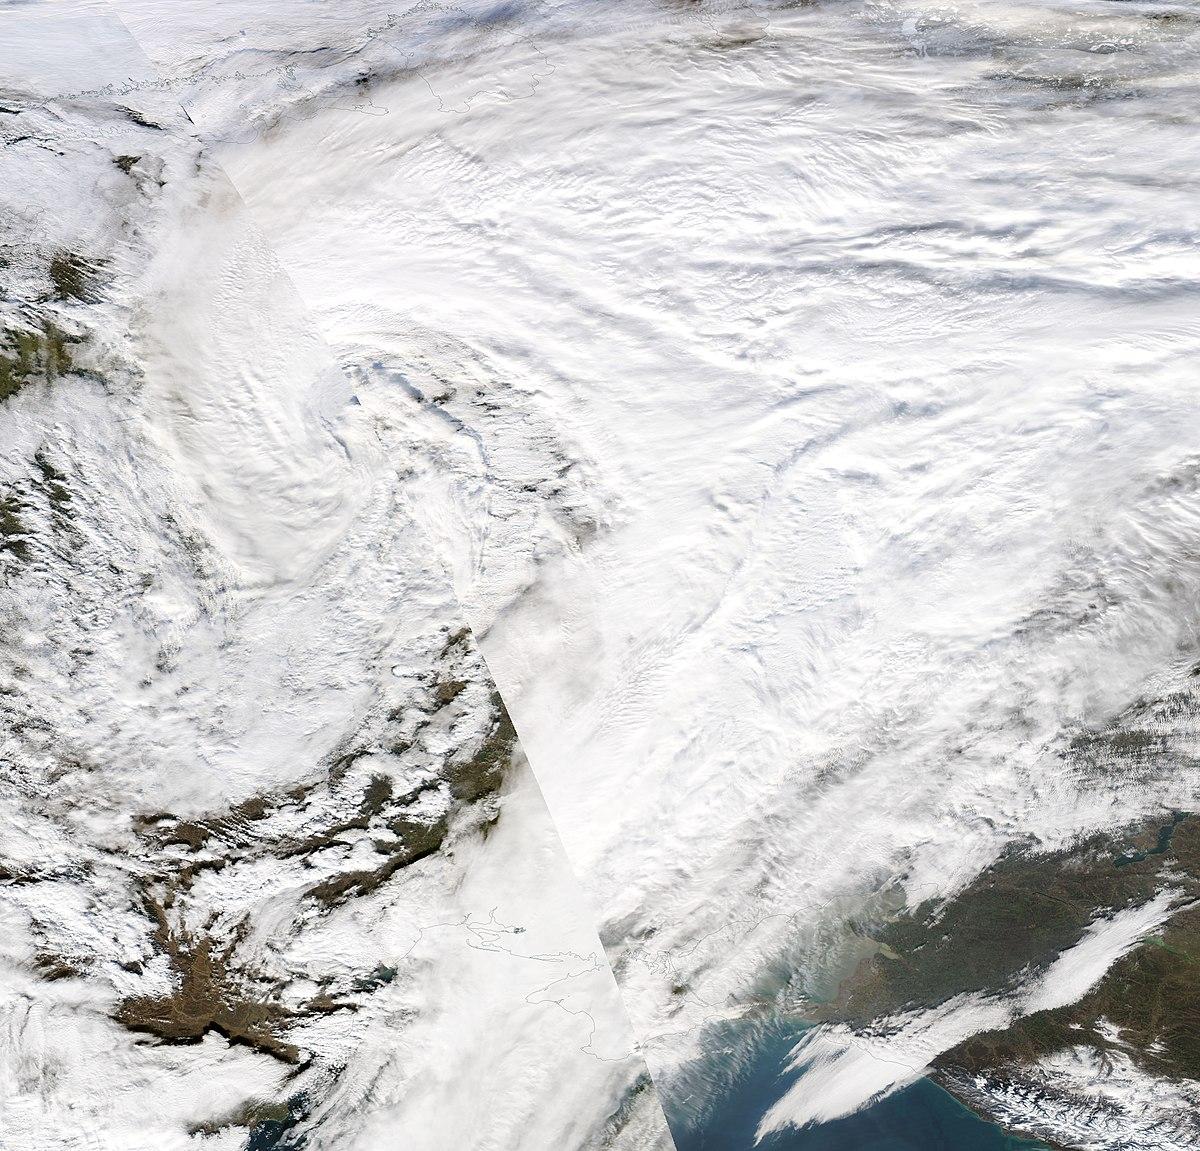 Cyclone Kyrill